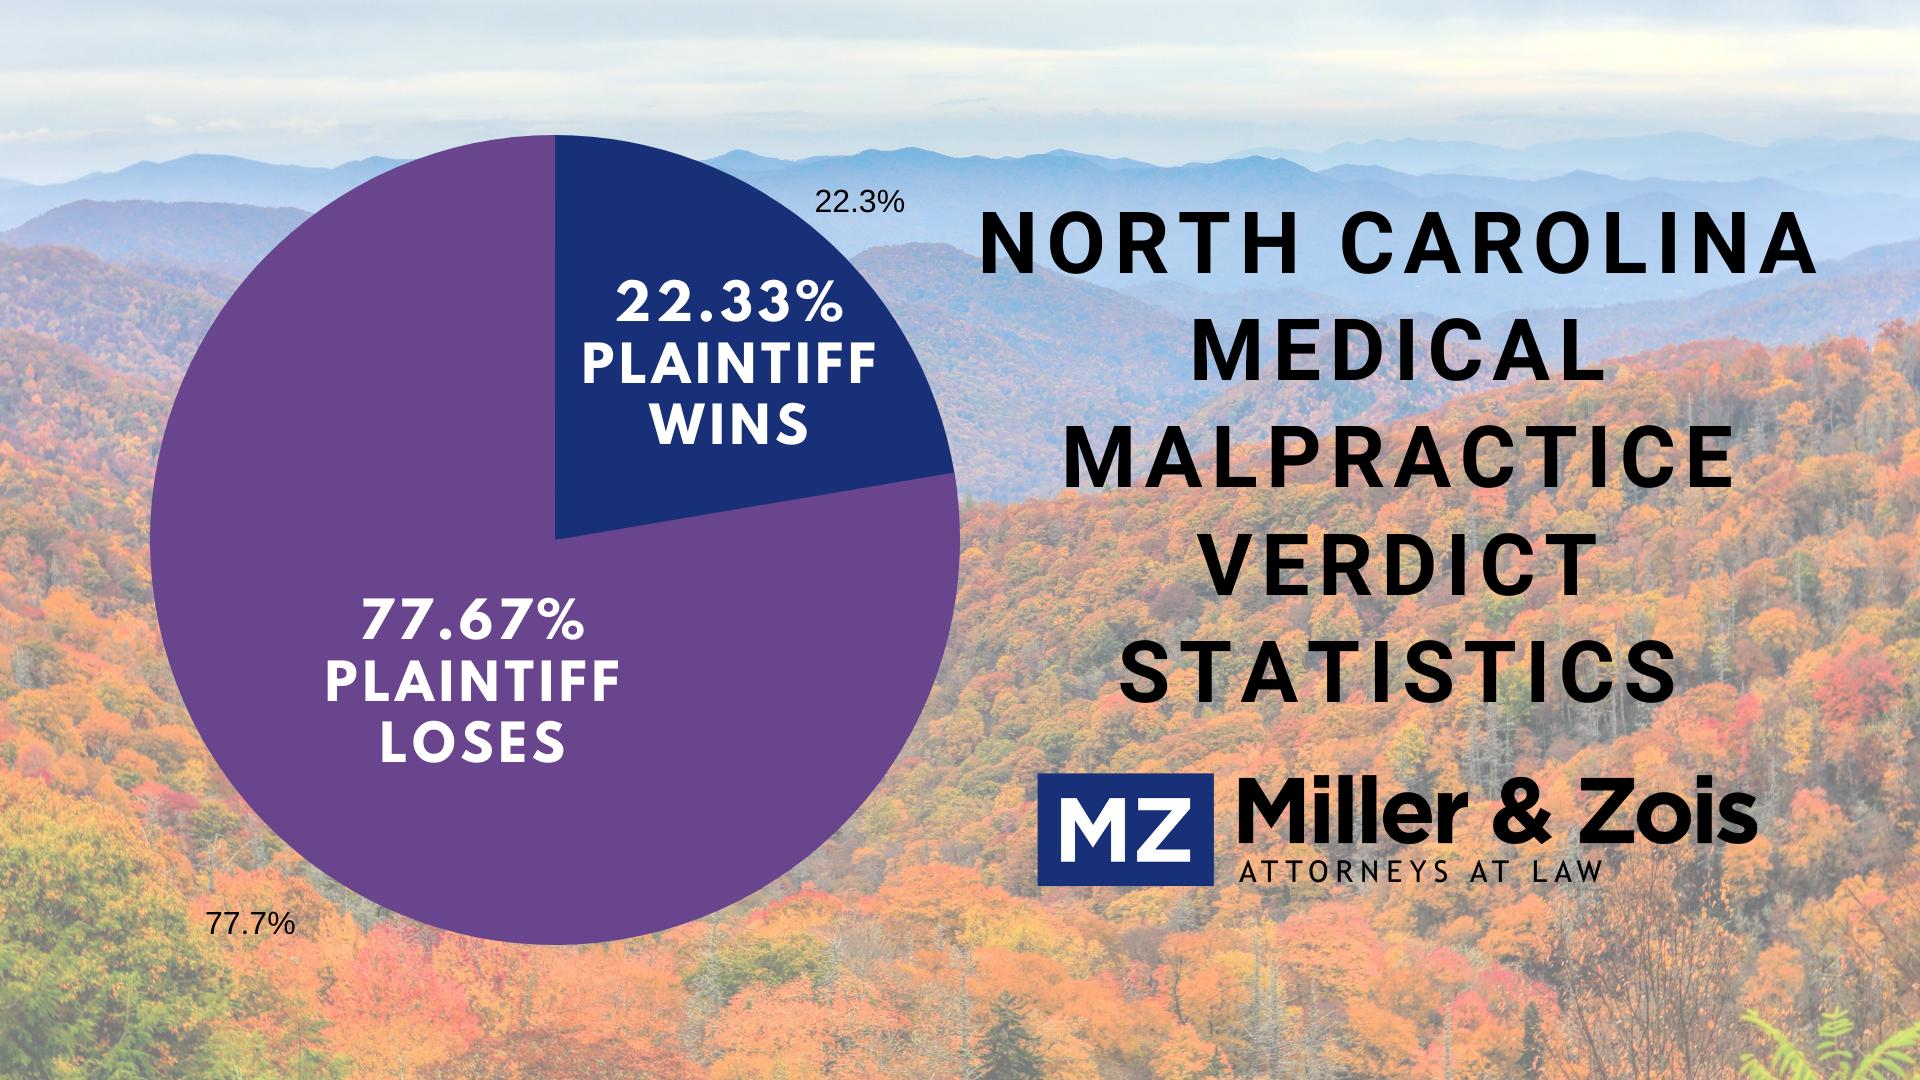 North Carolina medical malpractice